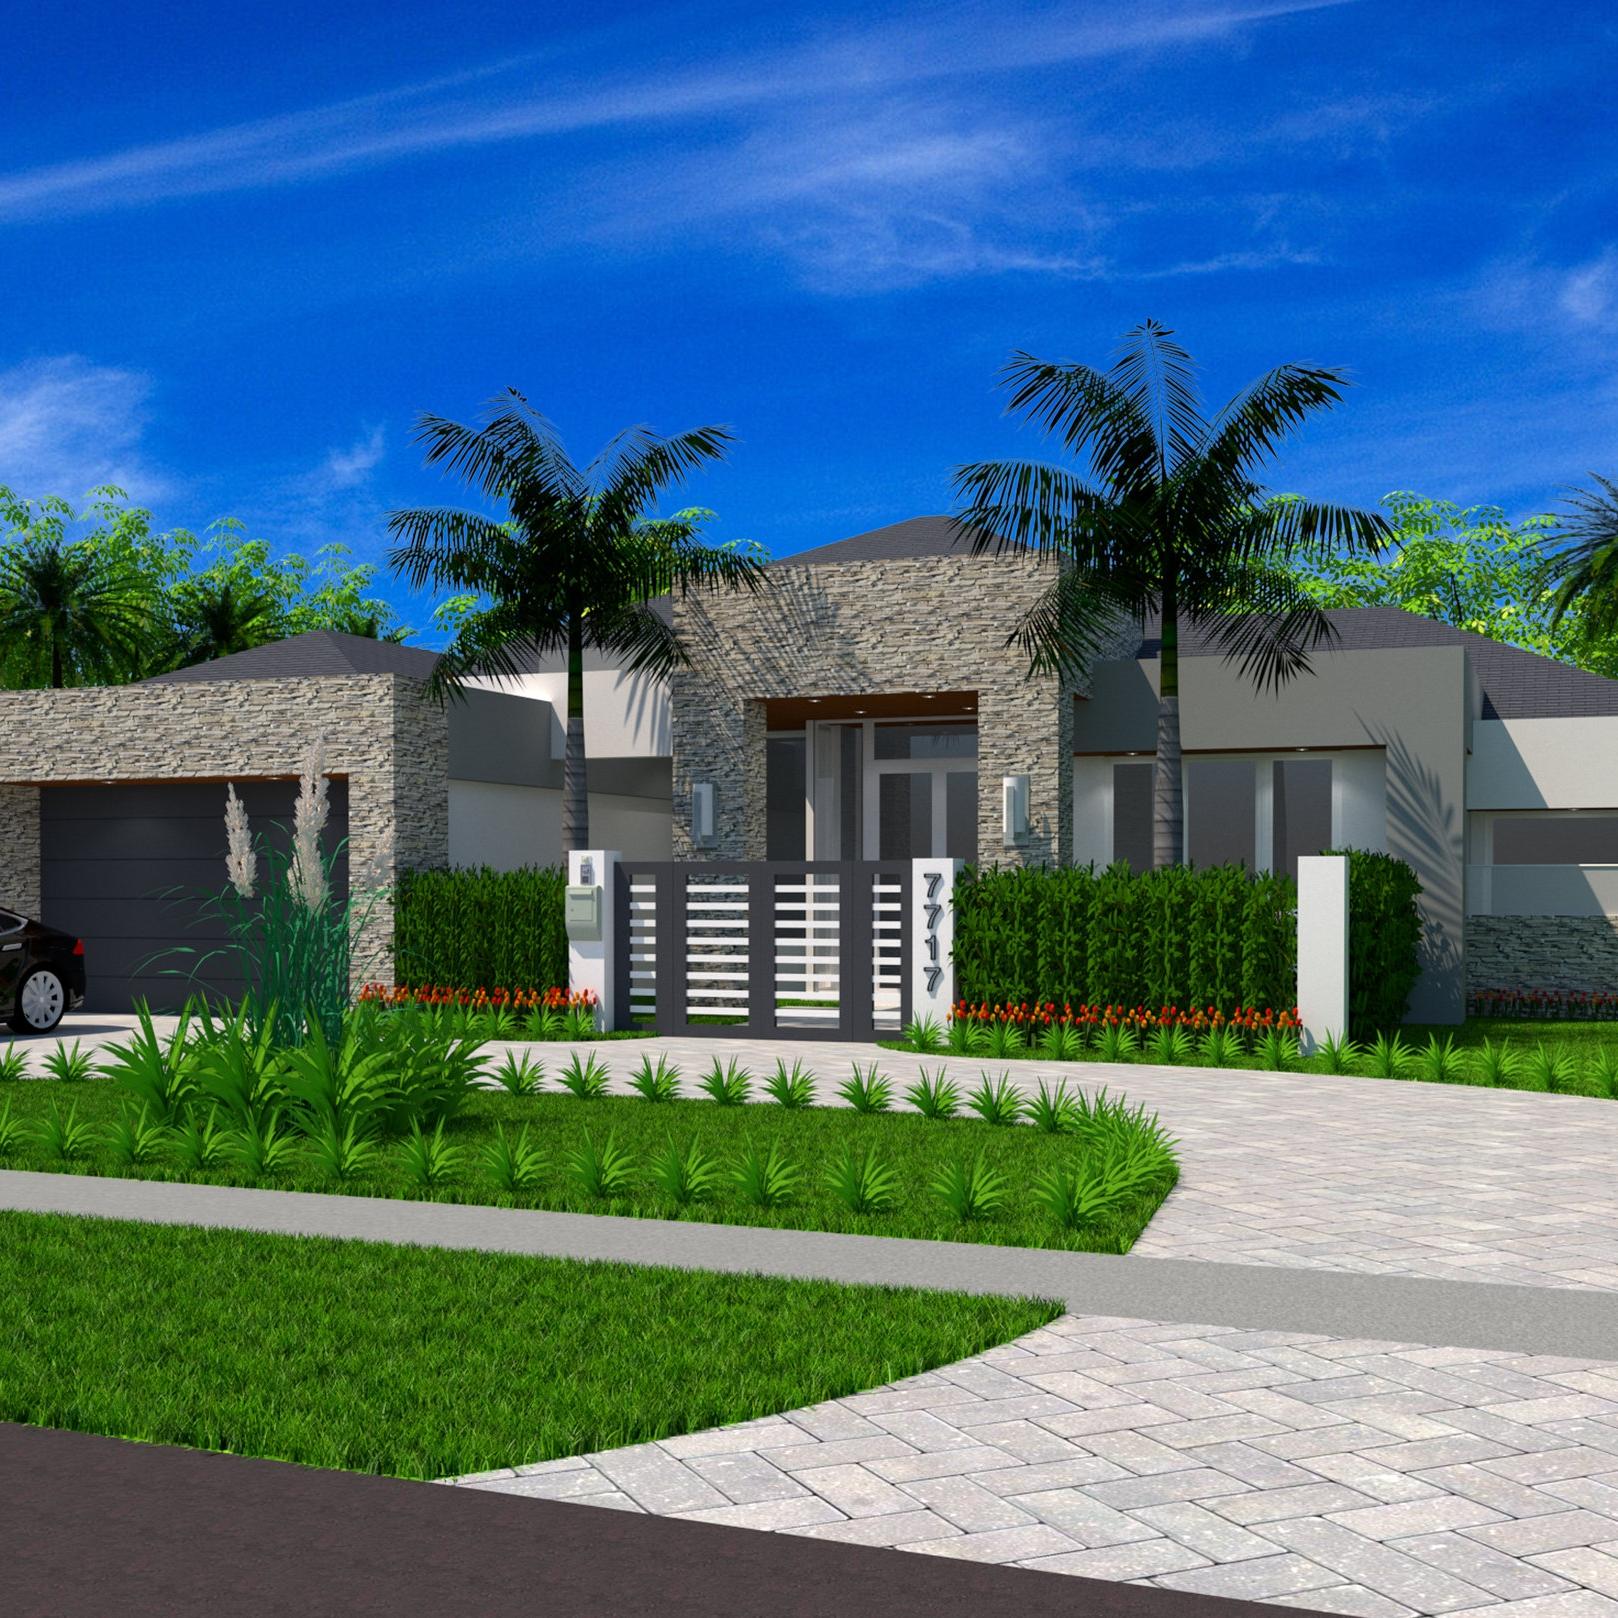 modern-home-florida-architecture-stone-exterior.jpg